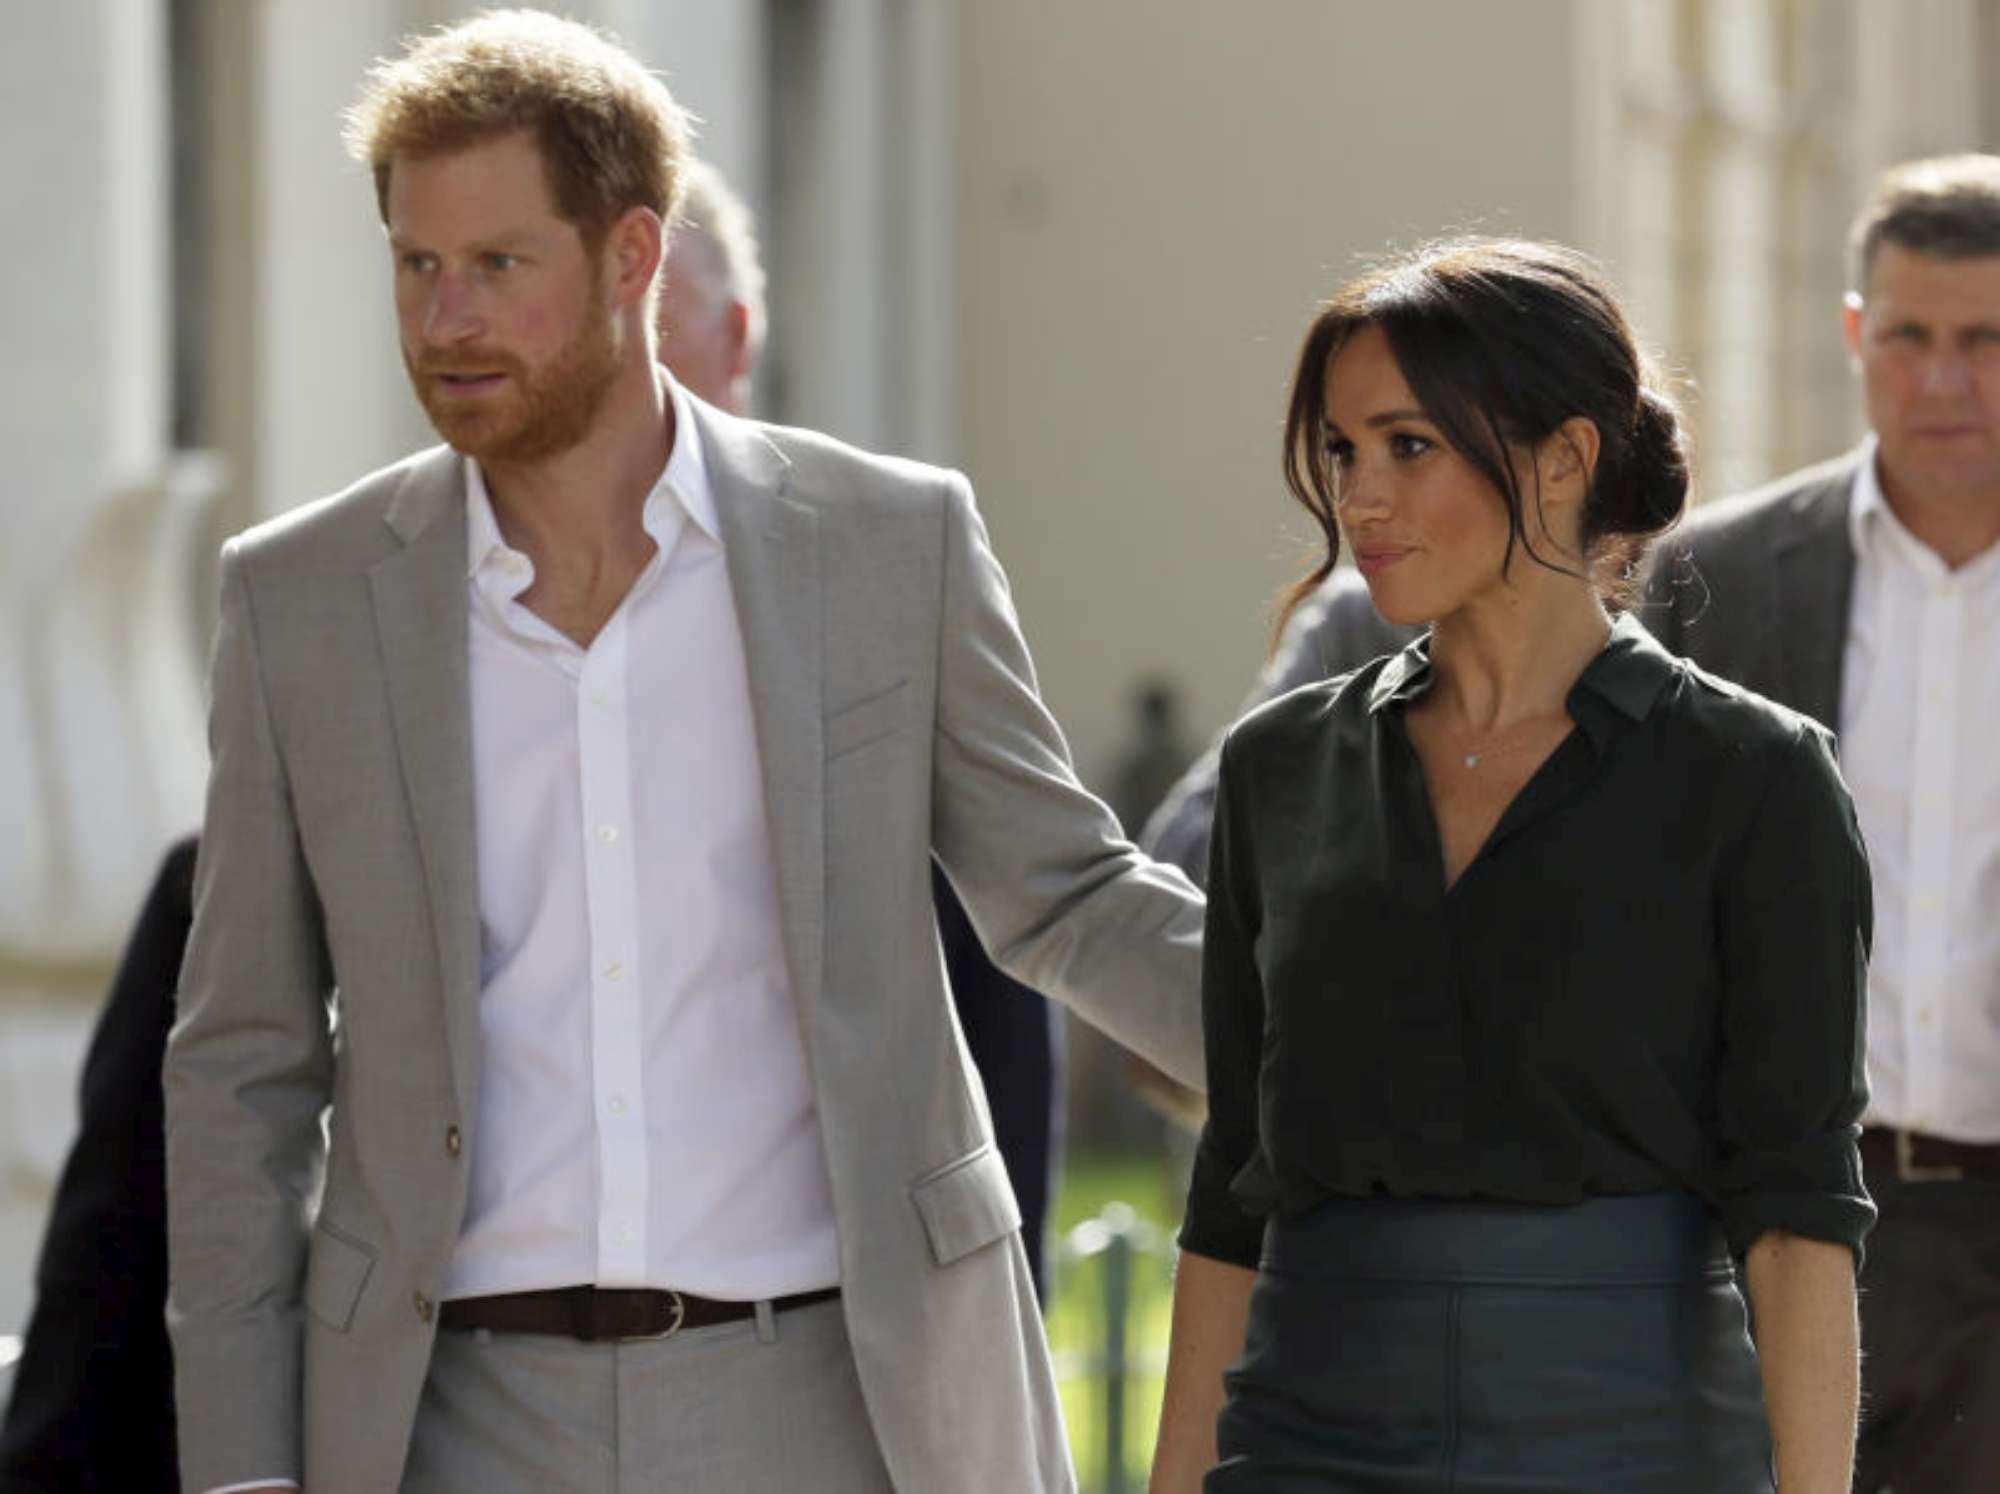 Meghan Markle è incinta: un bebè per il principe Harry